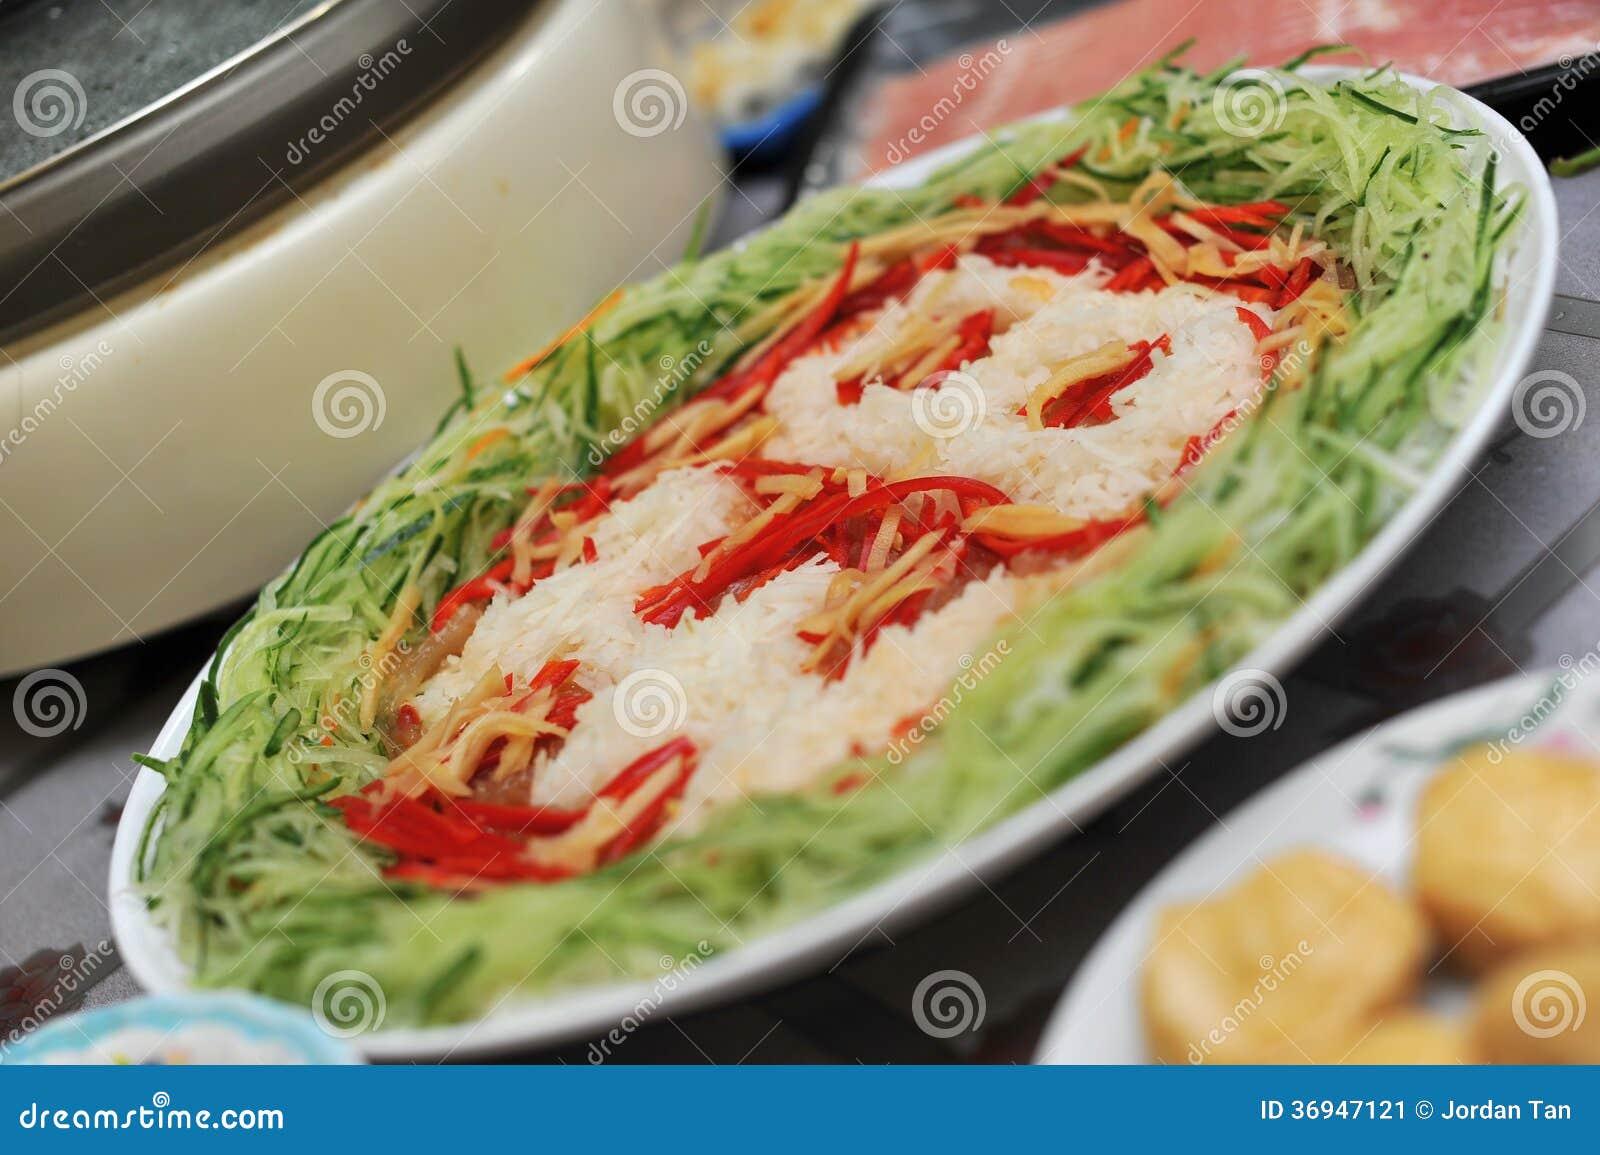 Plate Of Yu Sheng Raw Fish Salad Stock Image Image